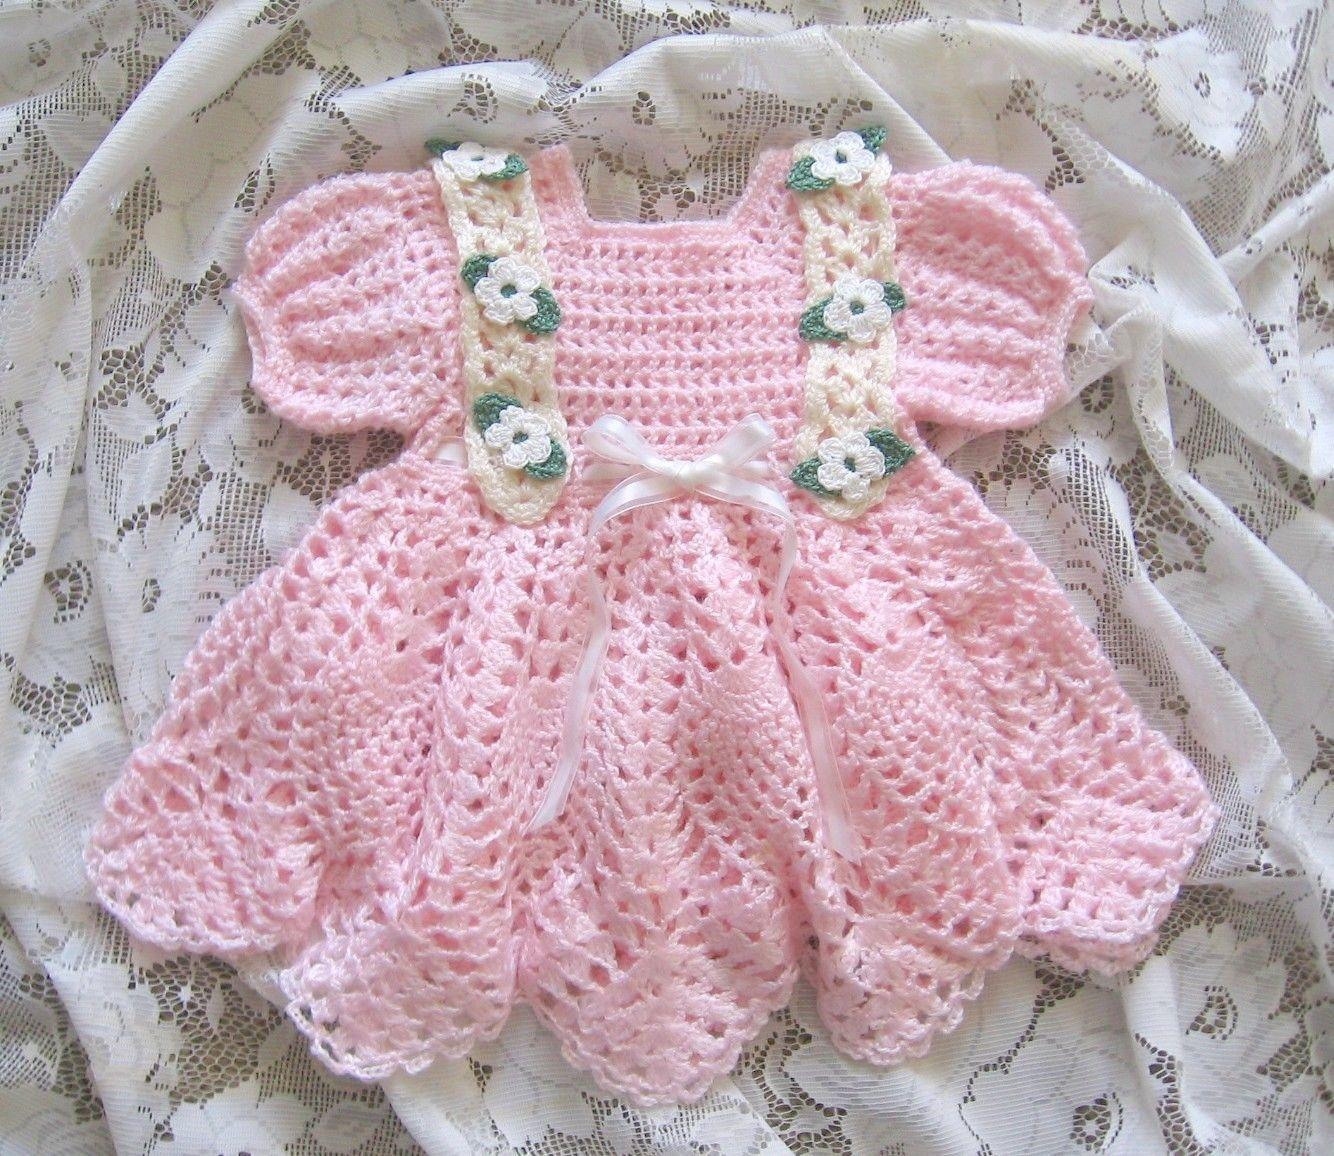 Baby Dresses To Crochet Patterns : CROCHET PATTERN for